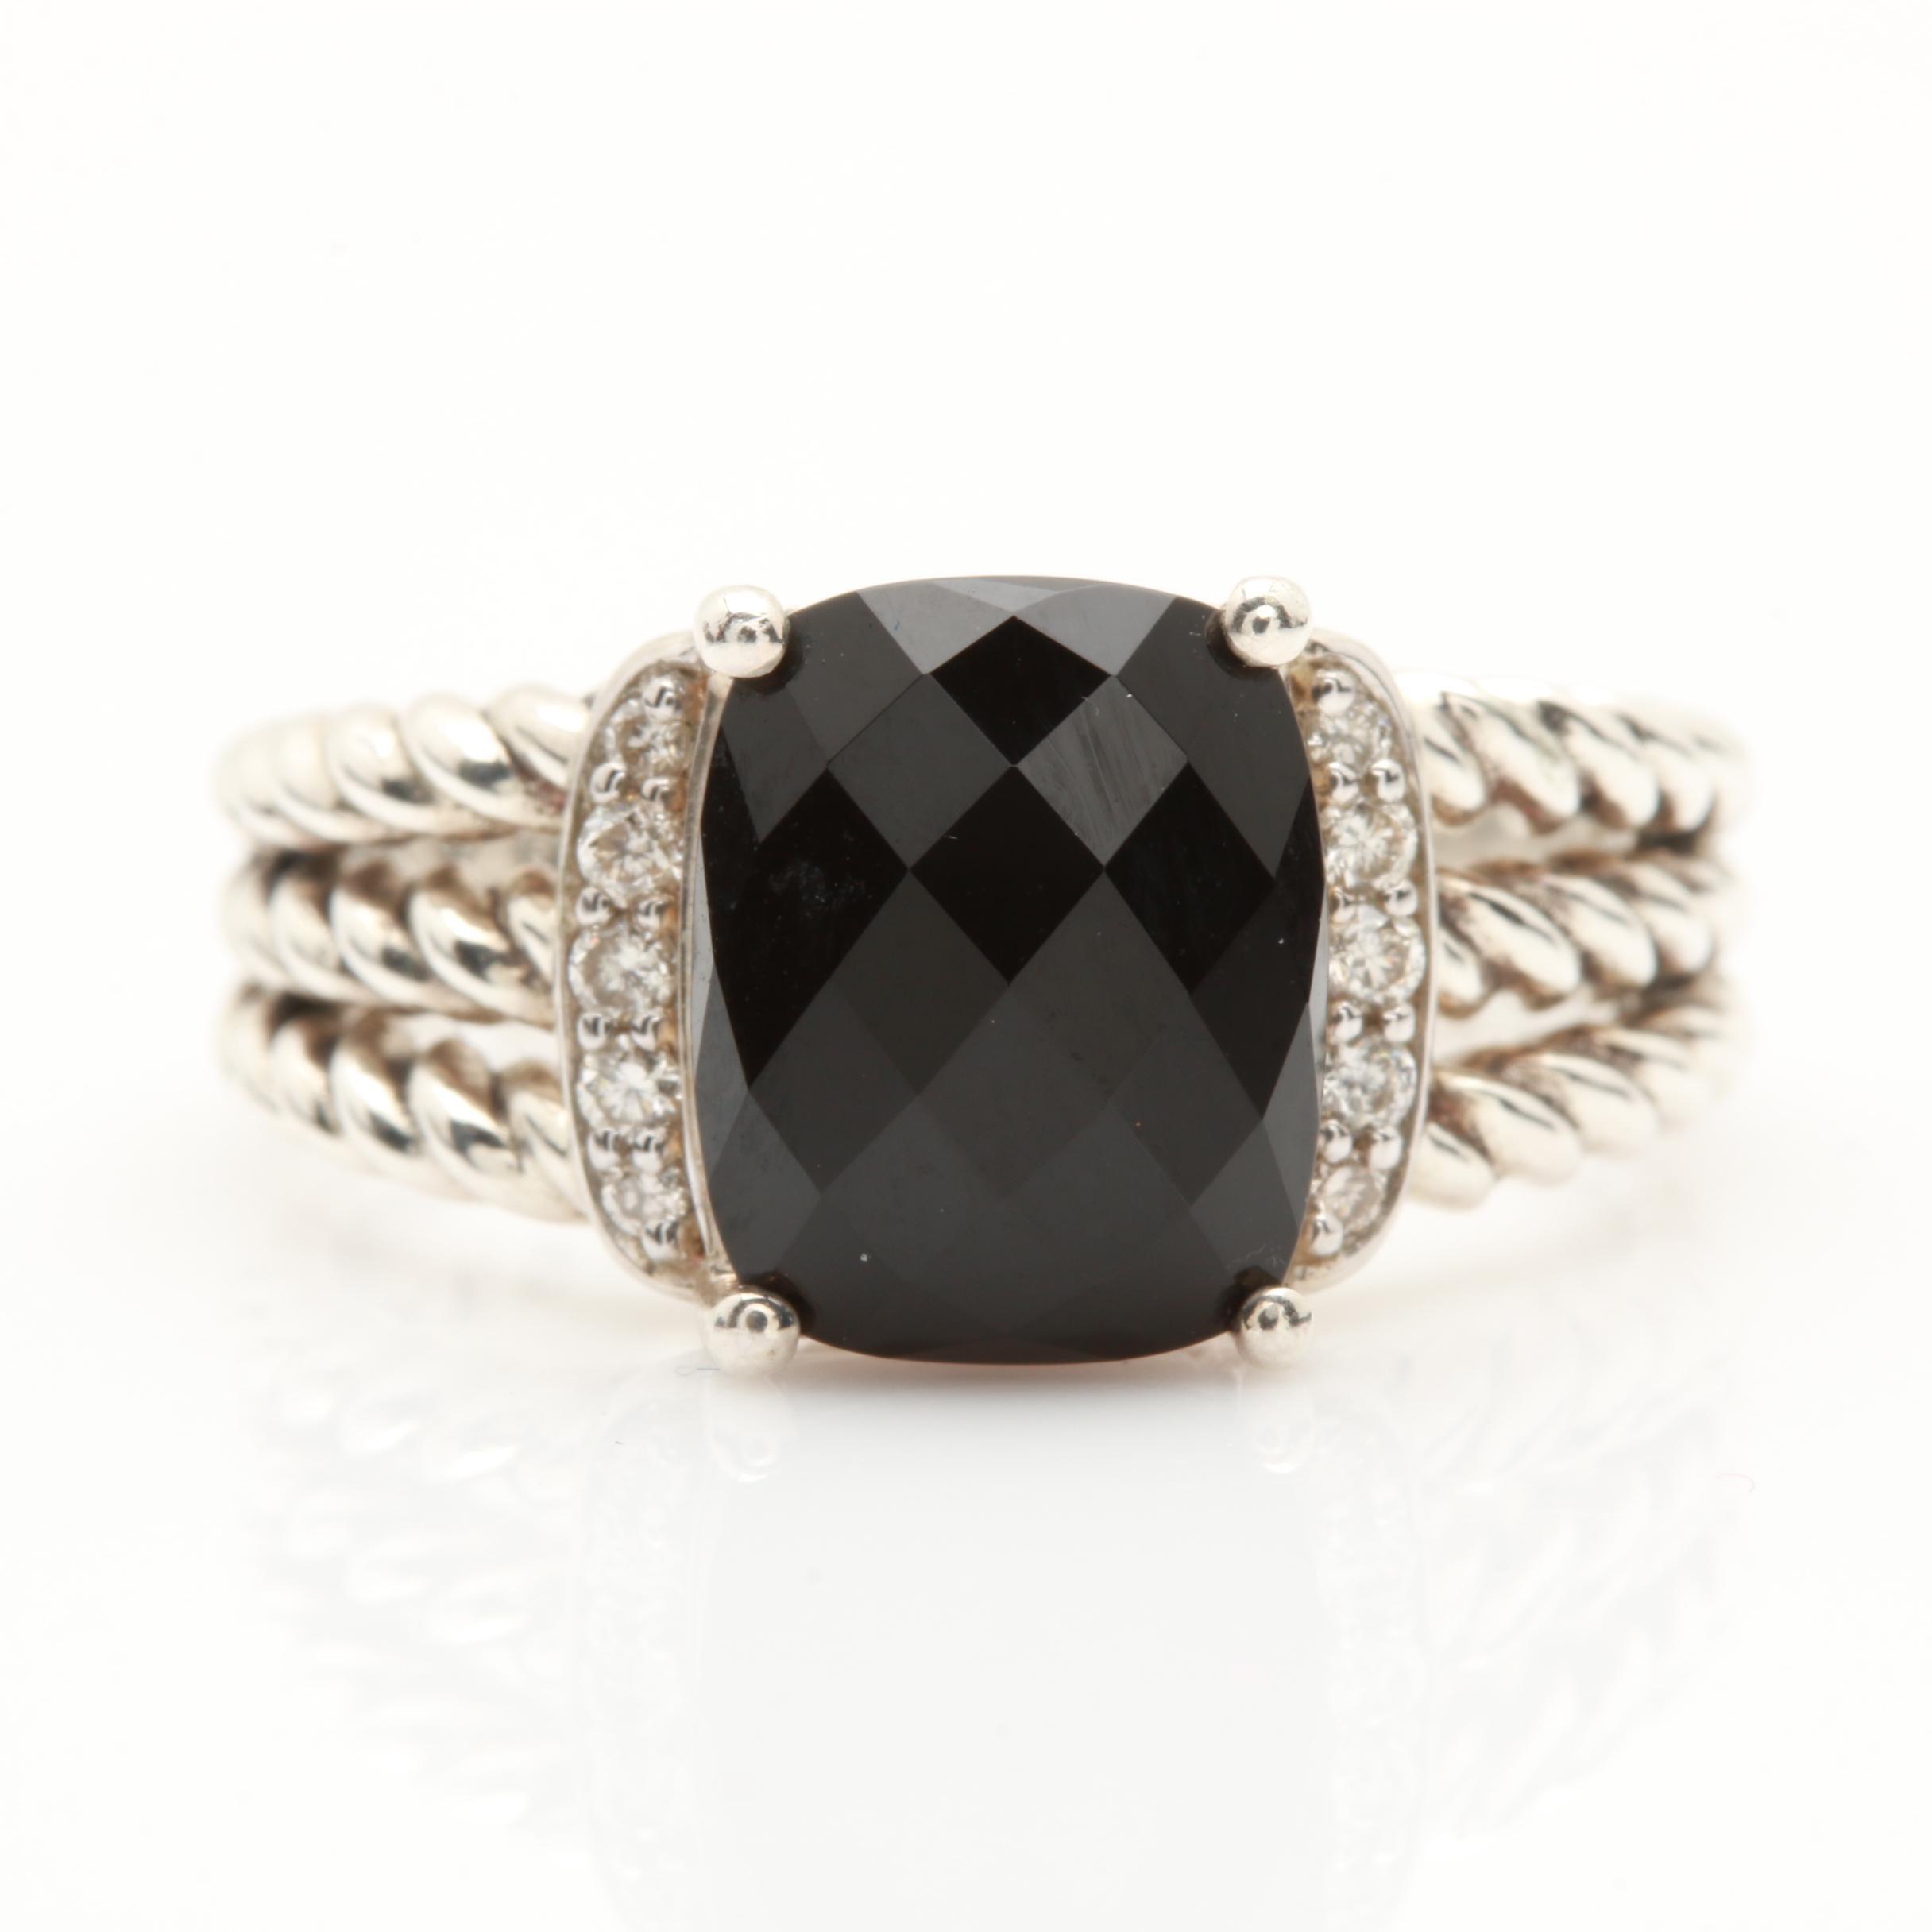 David Yurman Sterling Silver Black Onyx and Diamond Ring